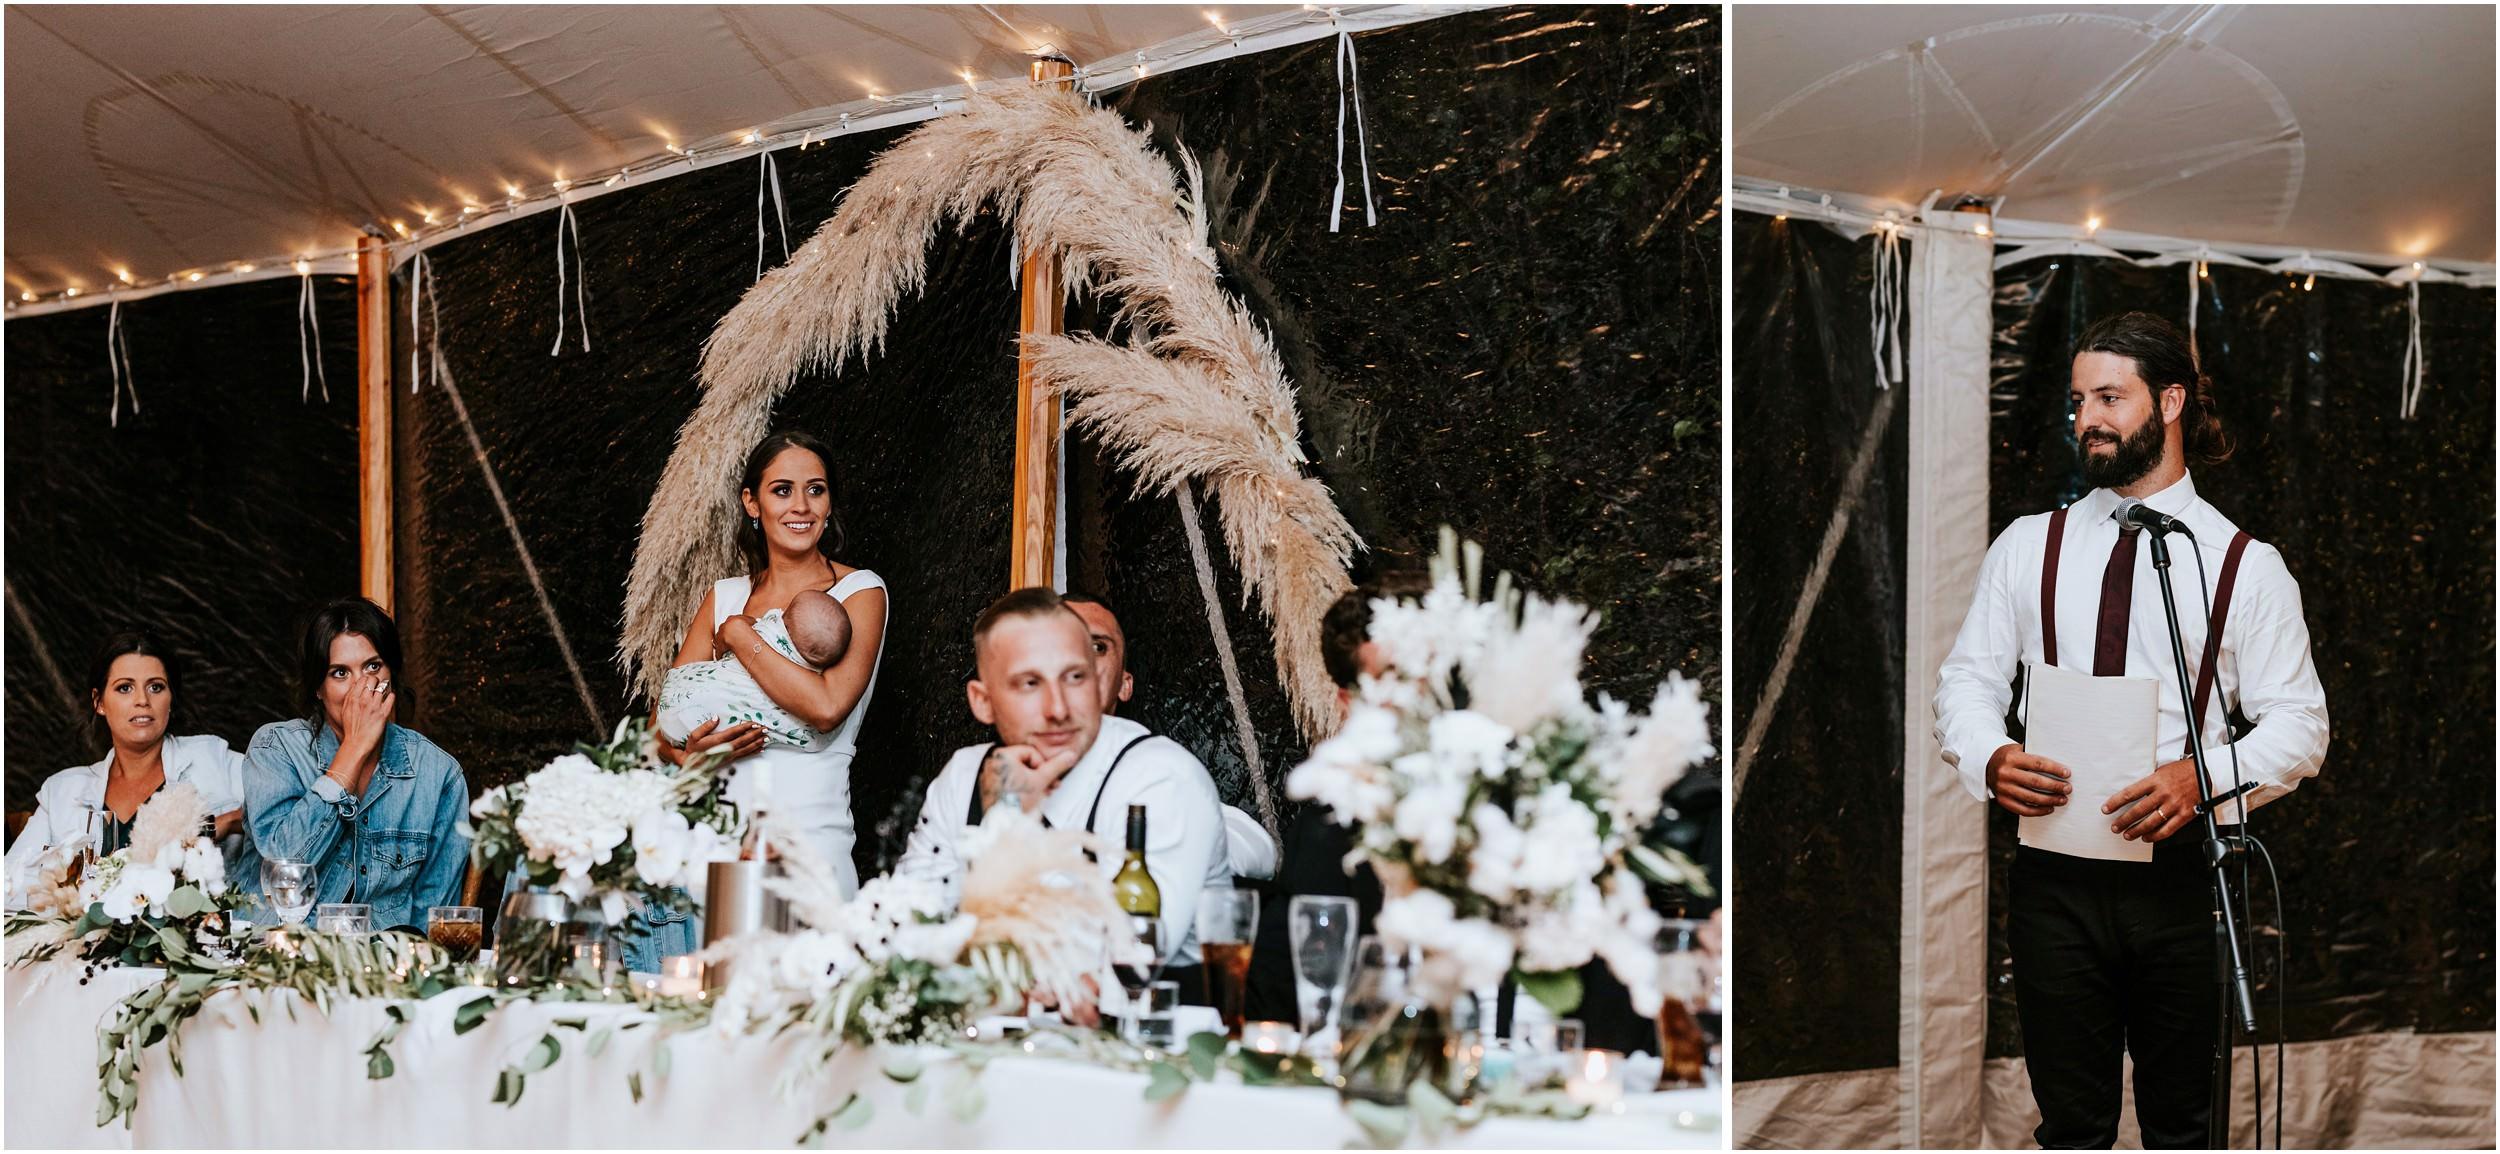 wedding_seacliff_house_alanah_keiran_0165.jpg